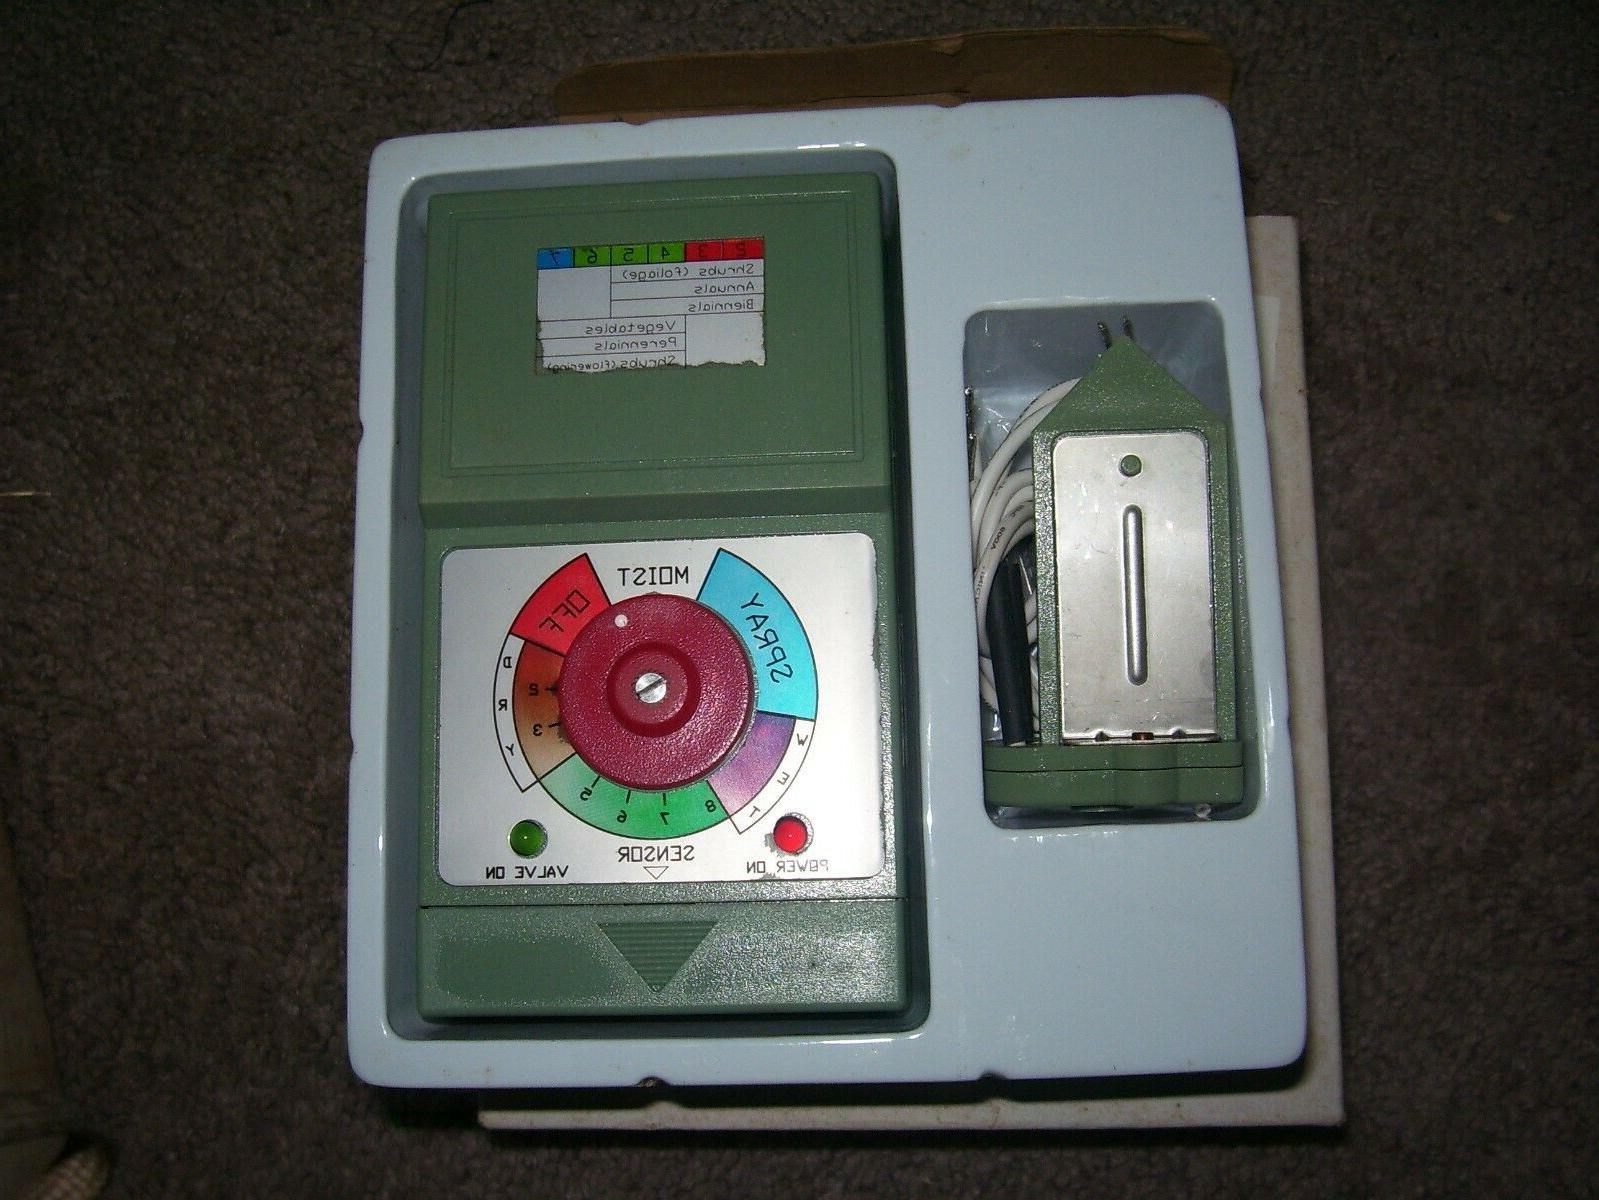 lawn moisture sprinkler valve controller